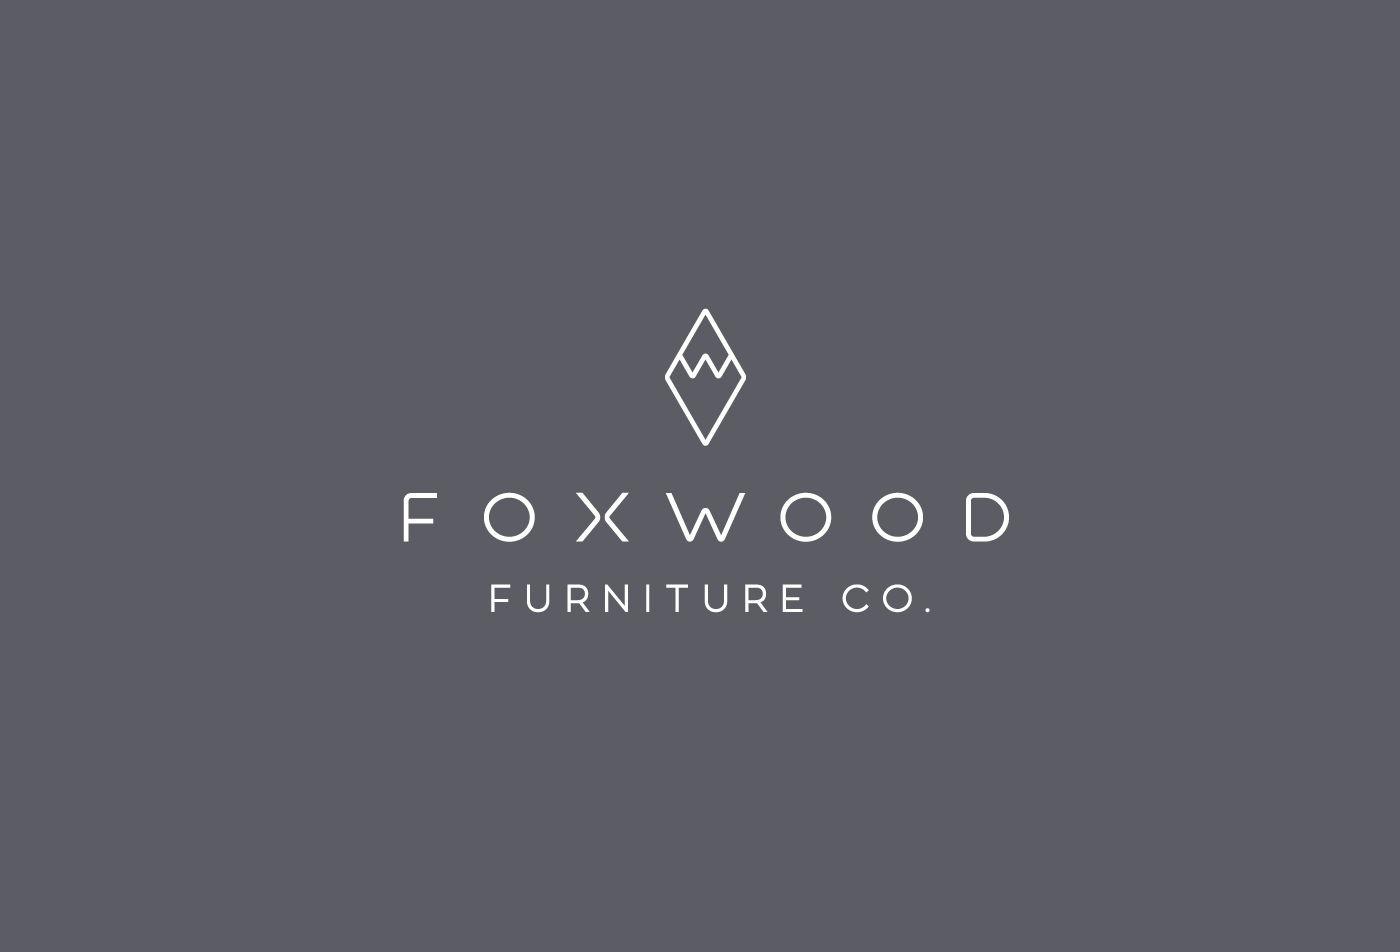 Freelance Graphic Designer |Logos Graphic Design Agency